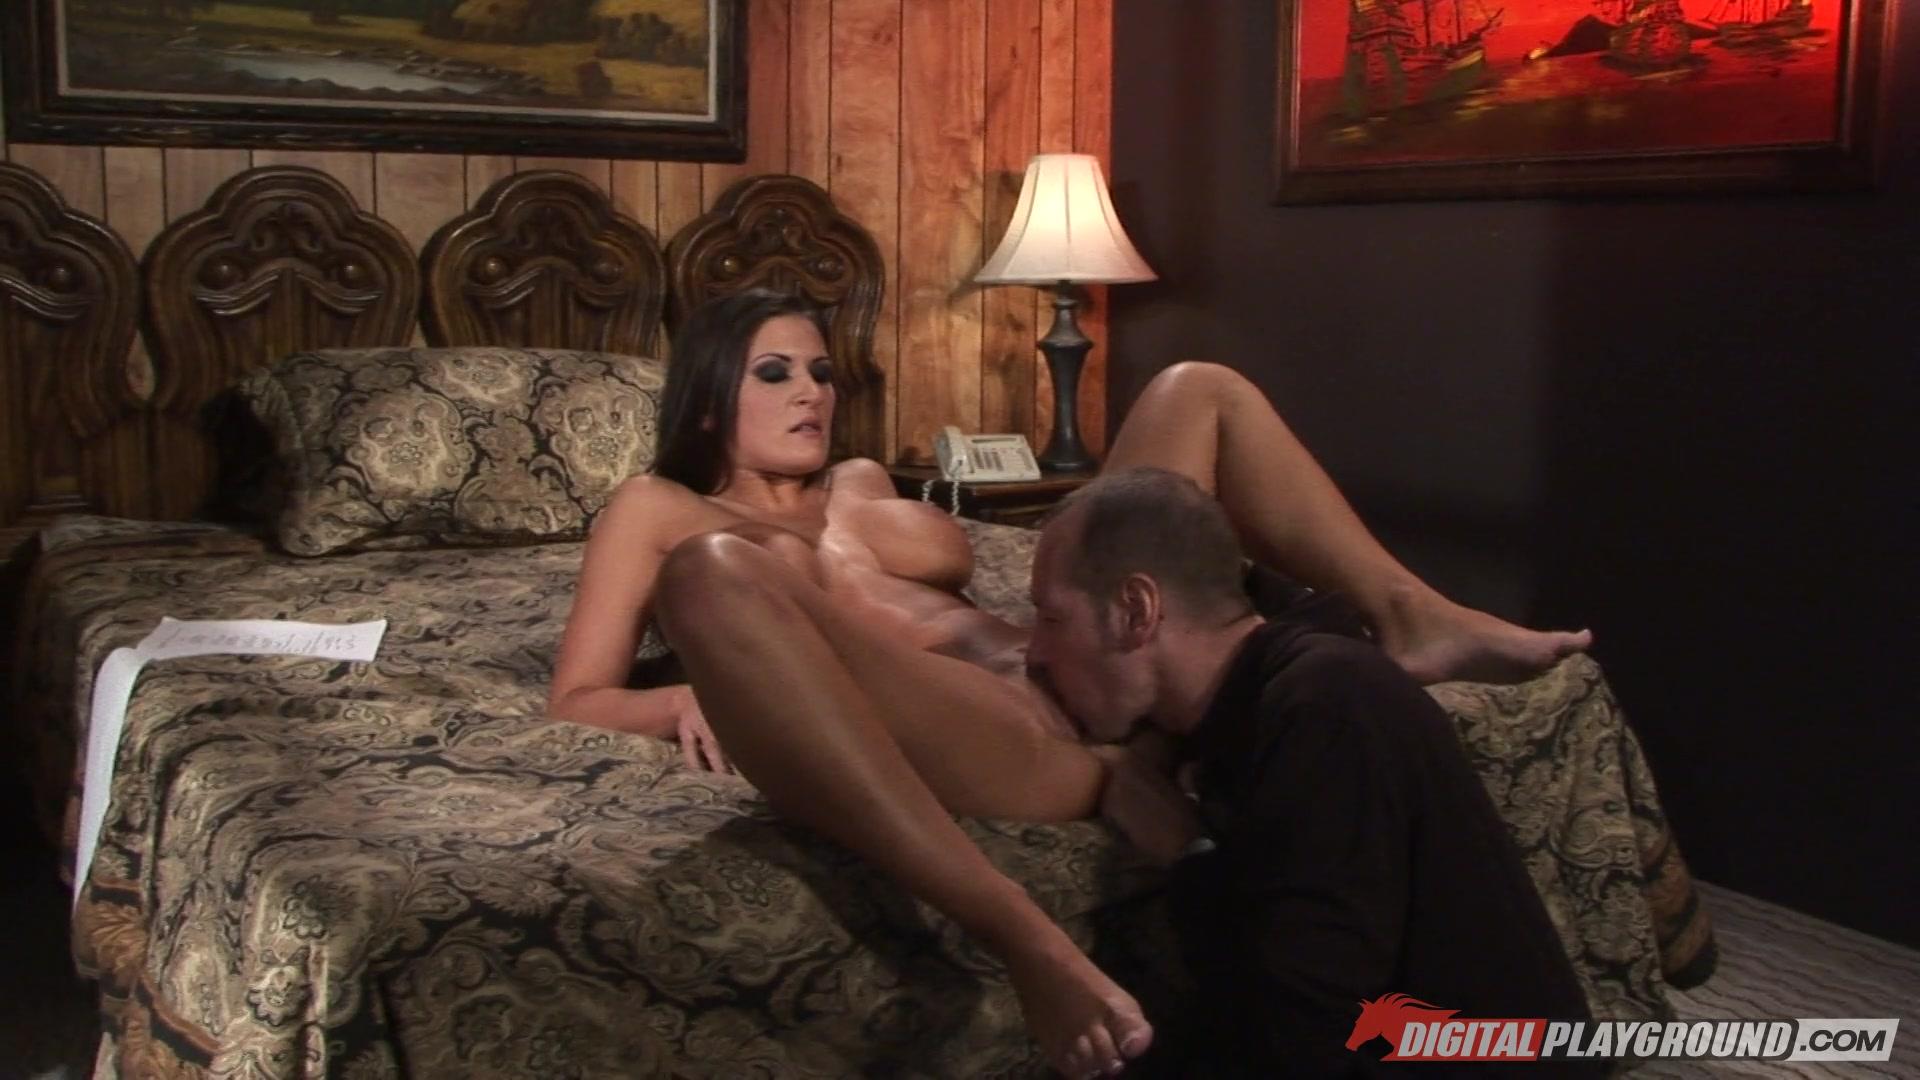 My first porn video